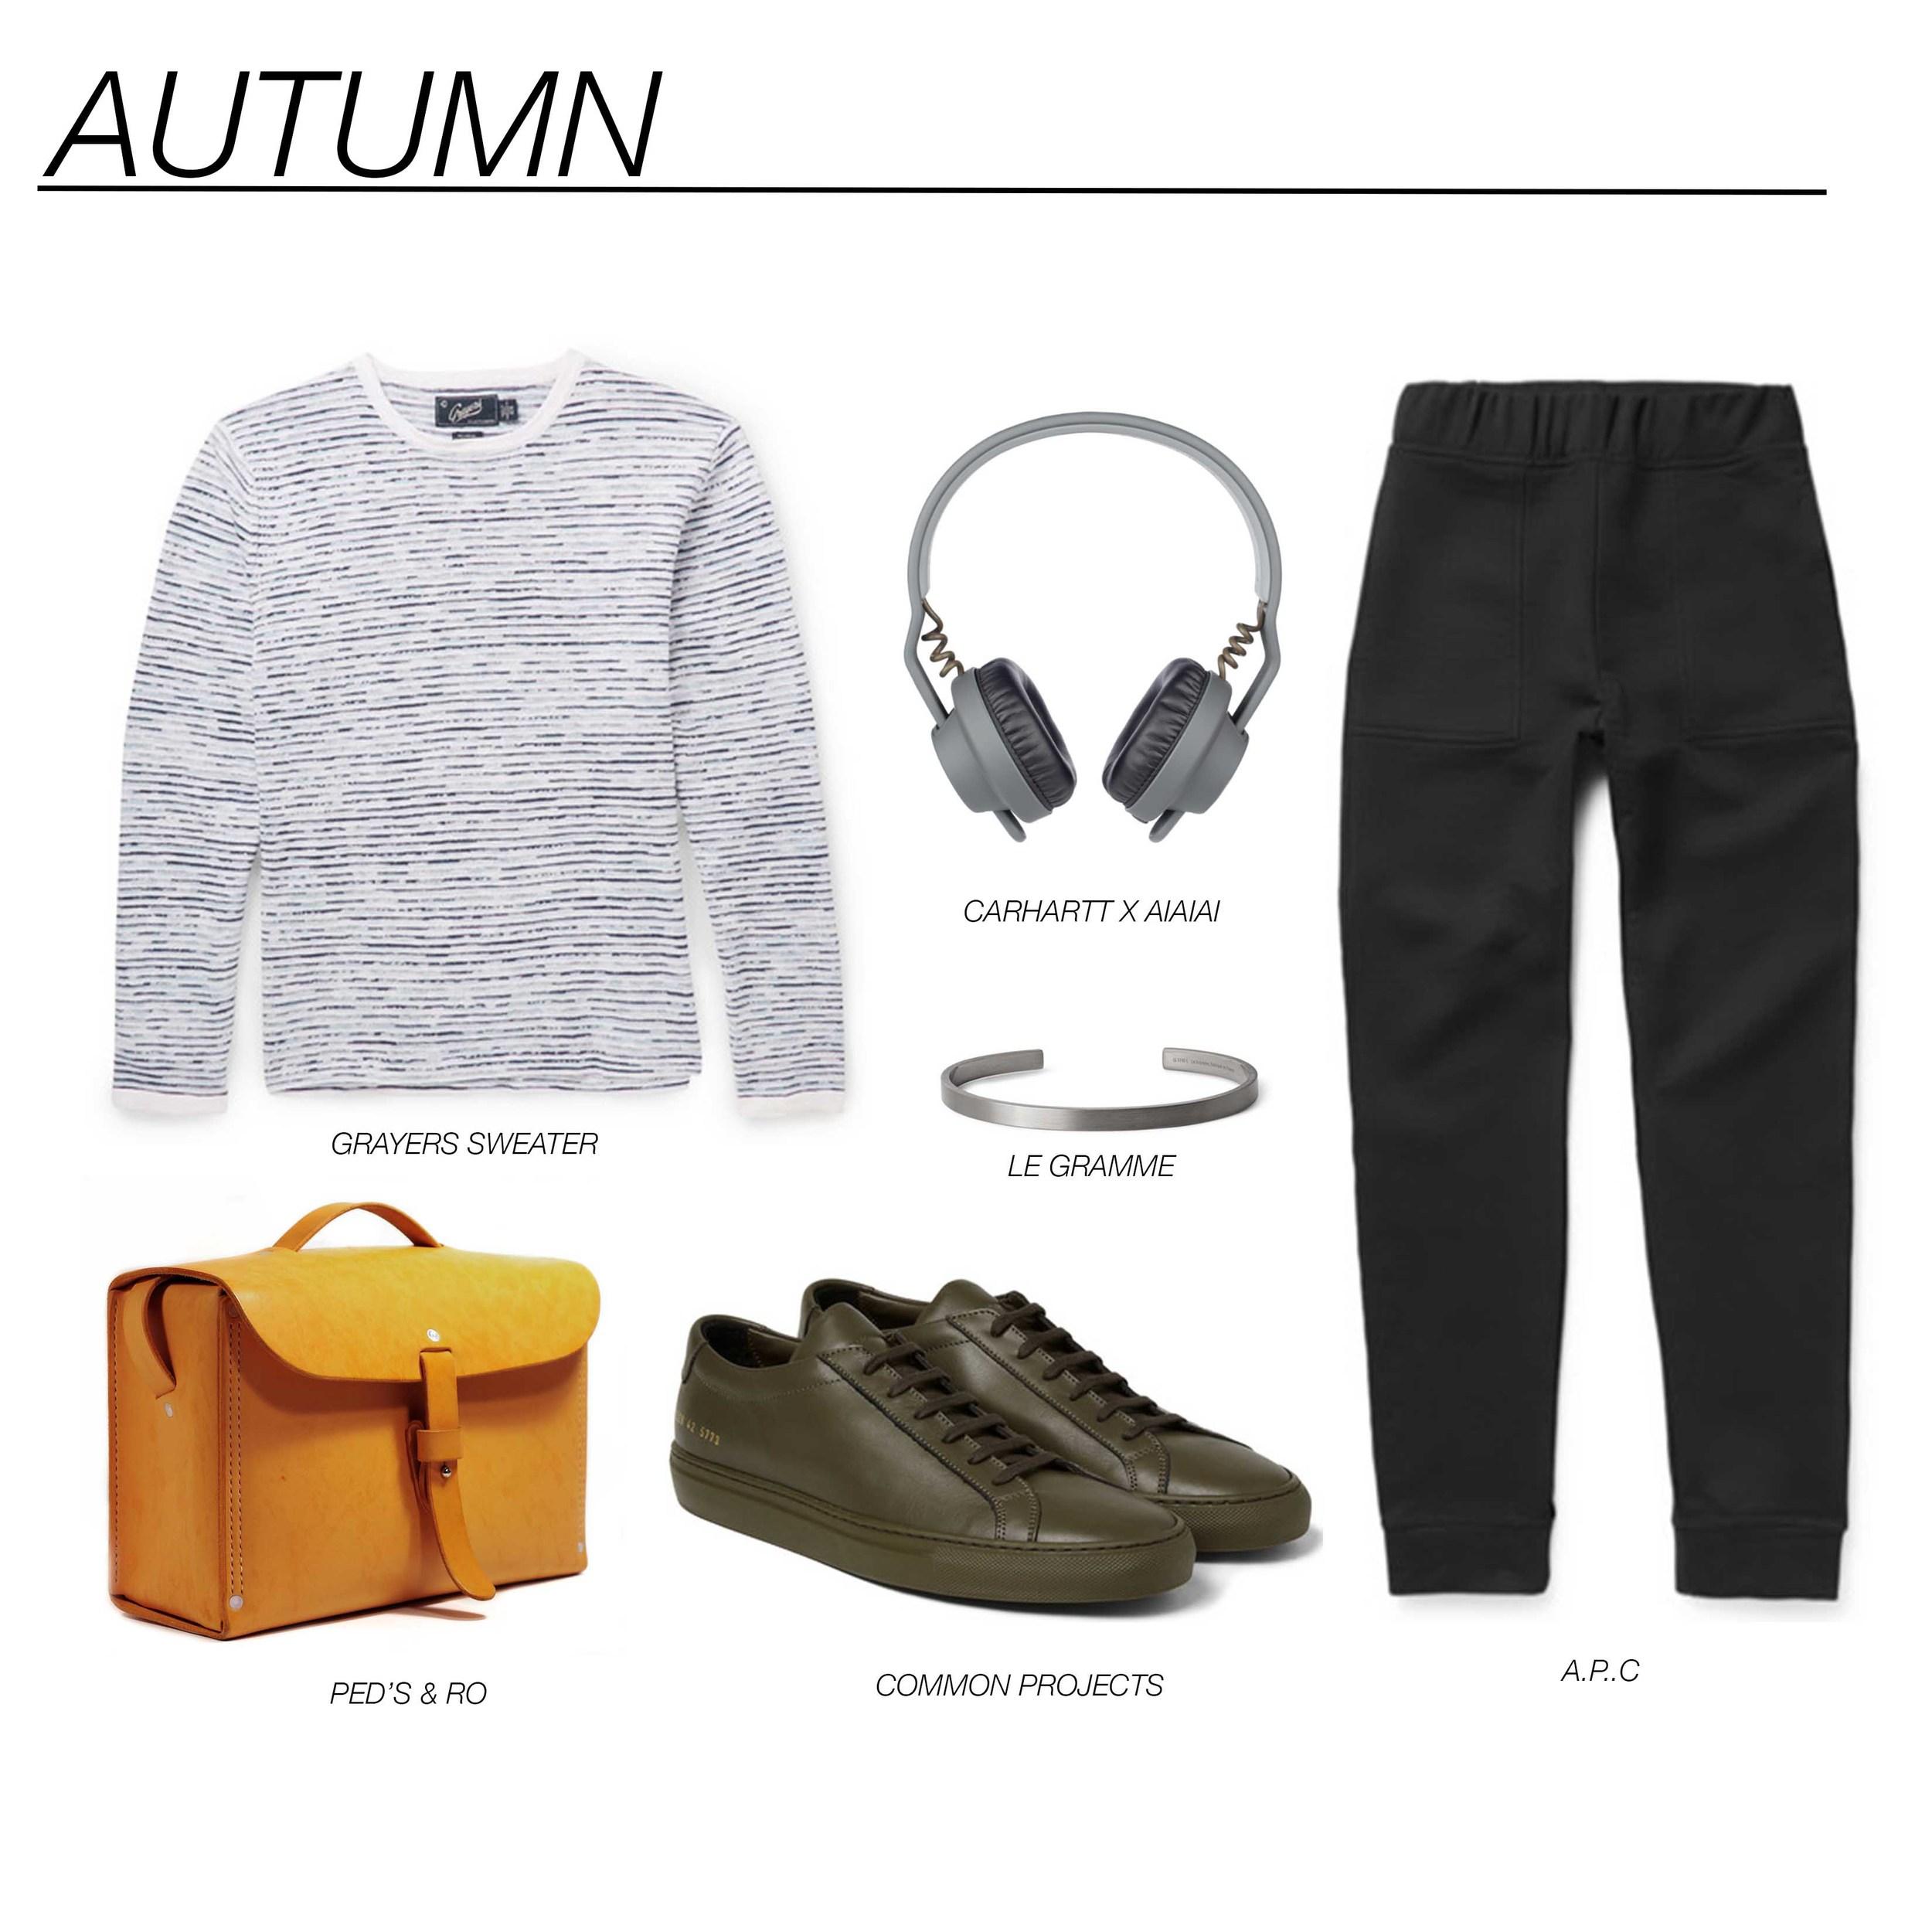 Autumn Outfit.jpg